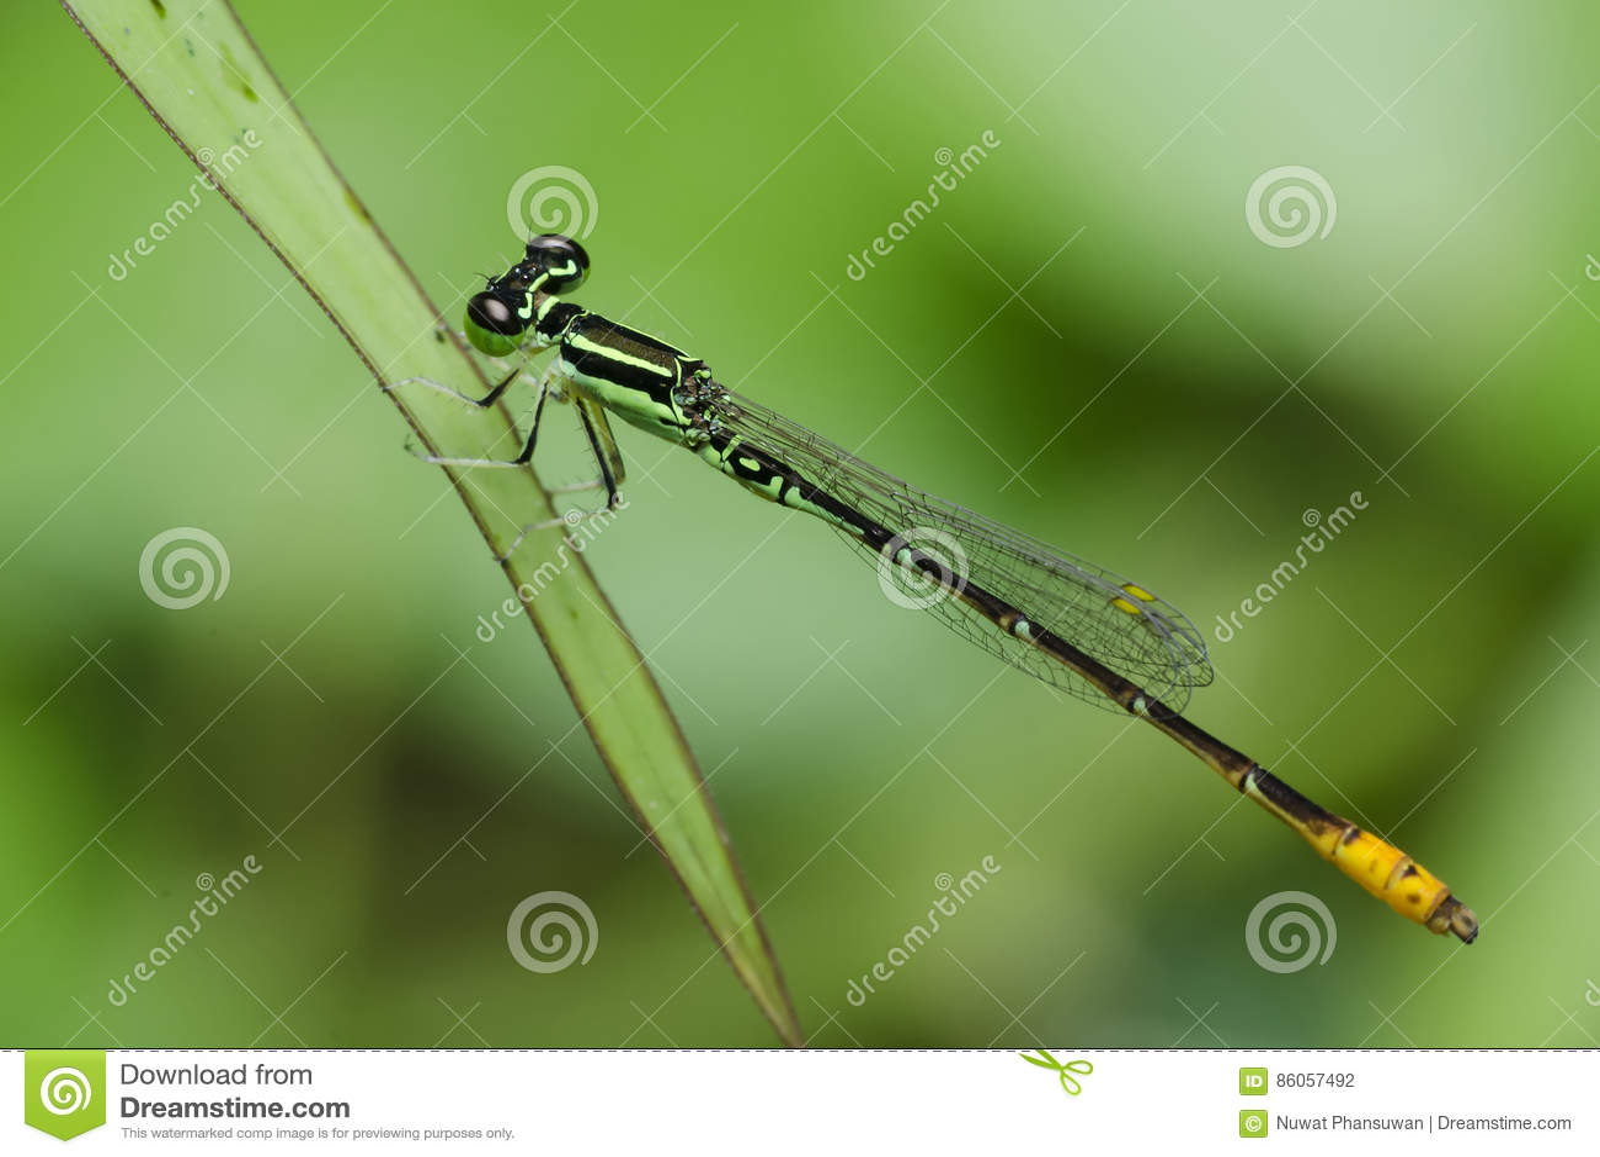 Libellule, libellules des minimum de la Thaïlande Agriocnemis